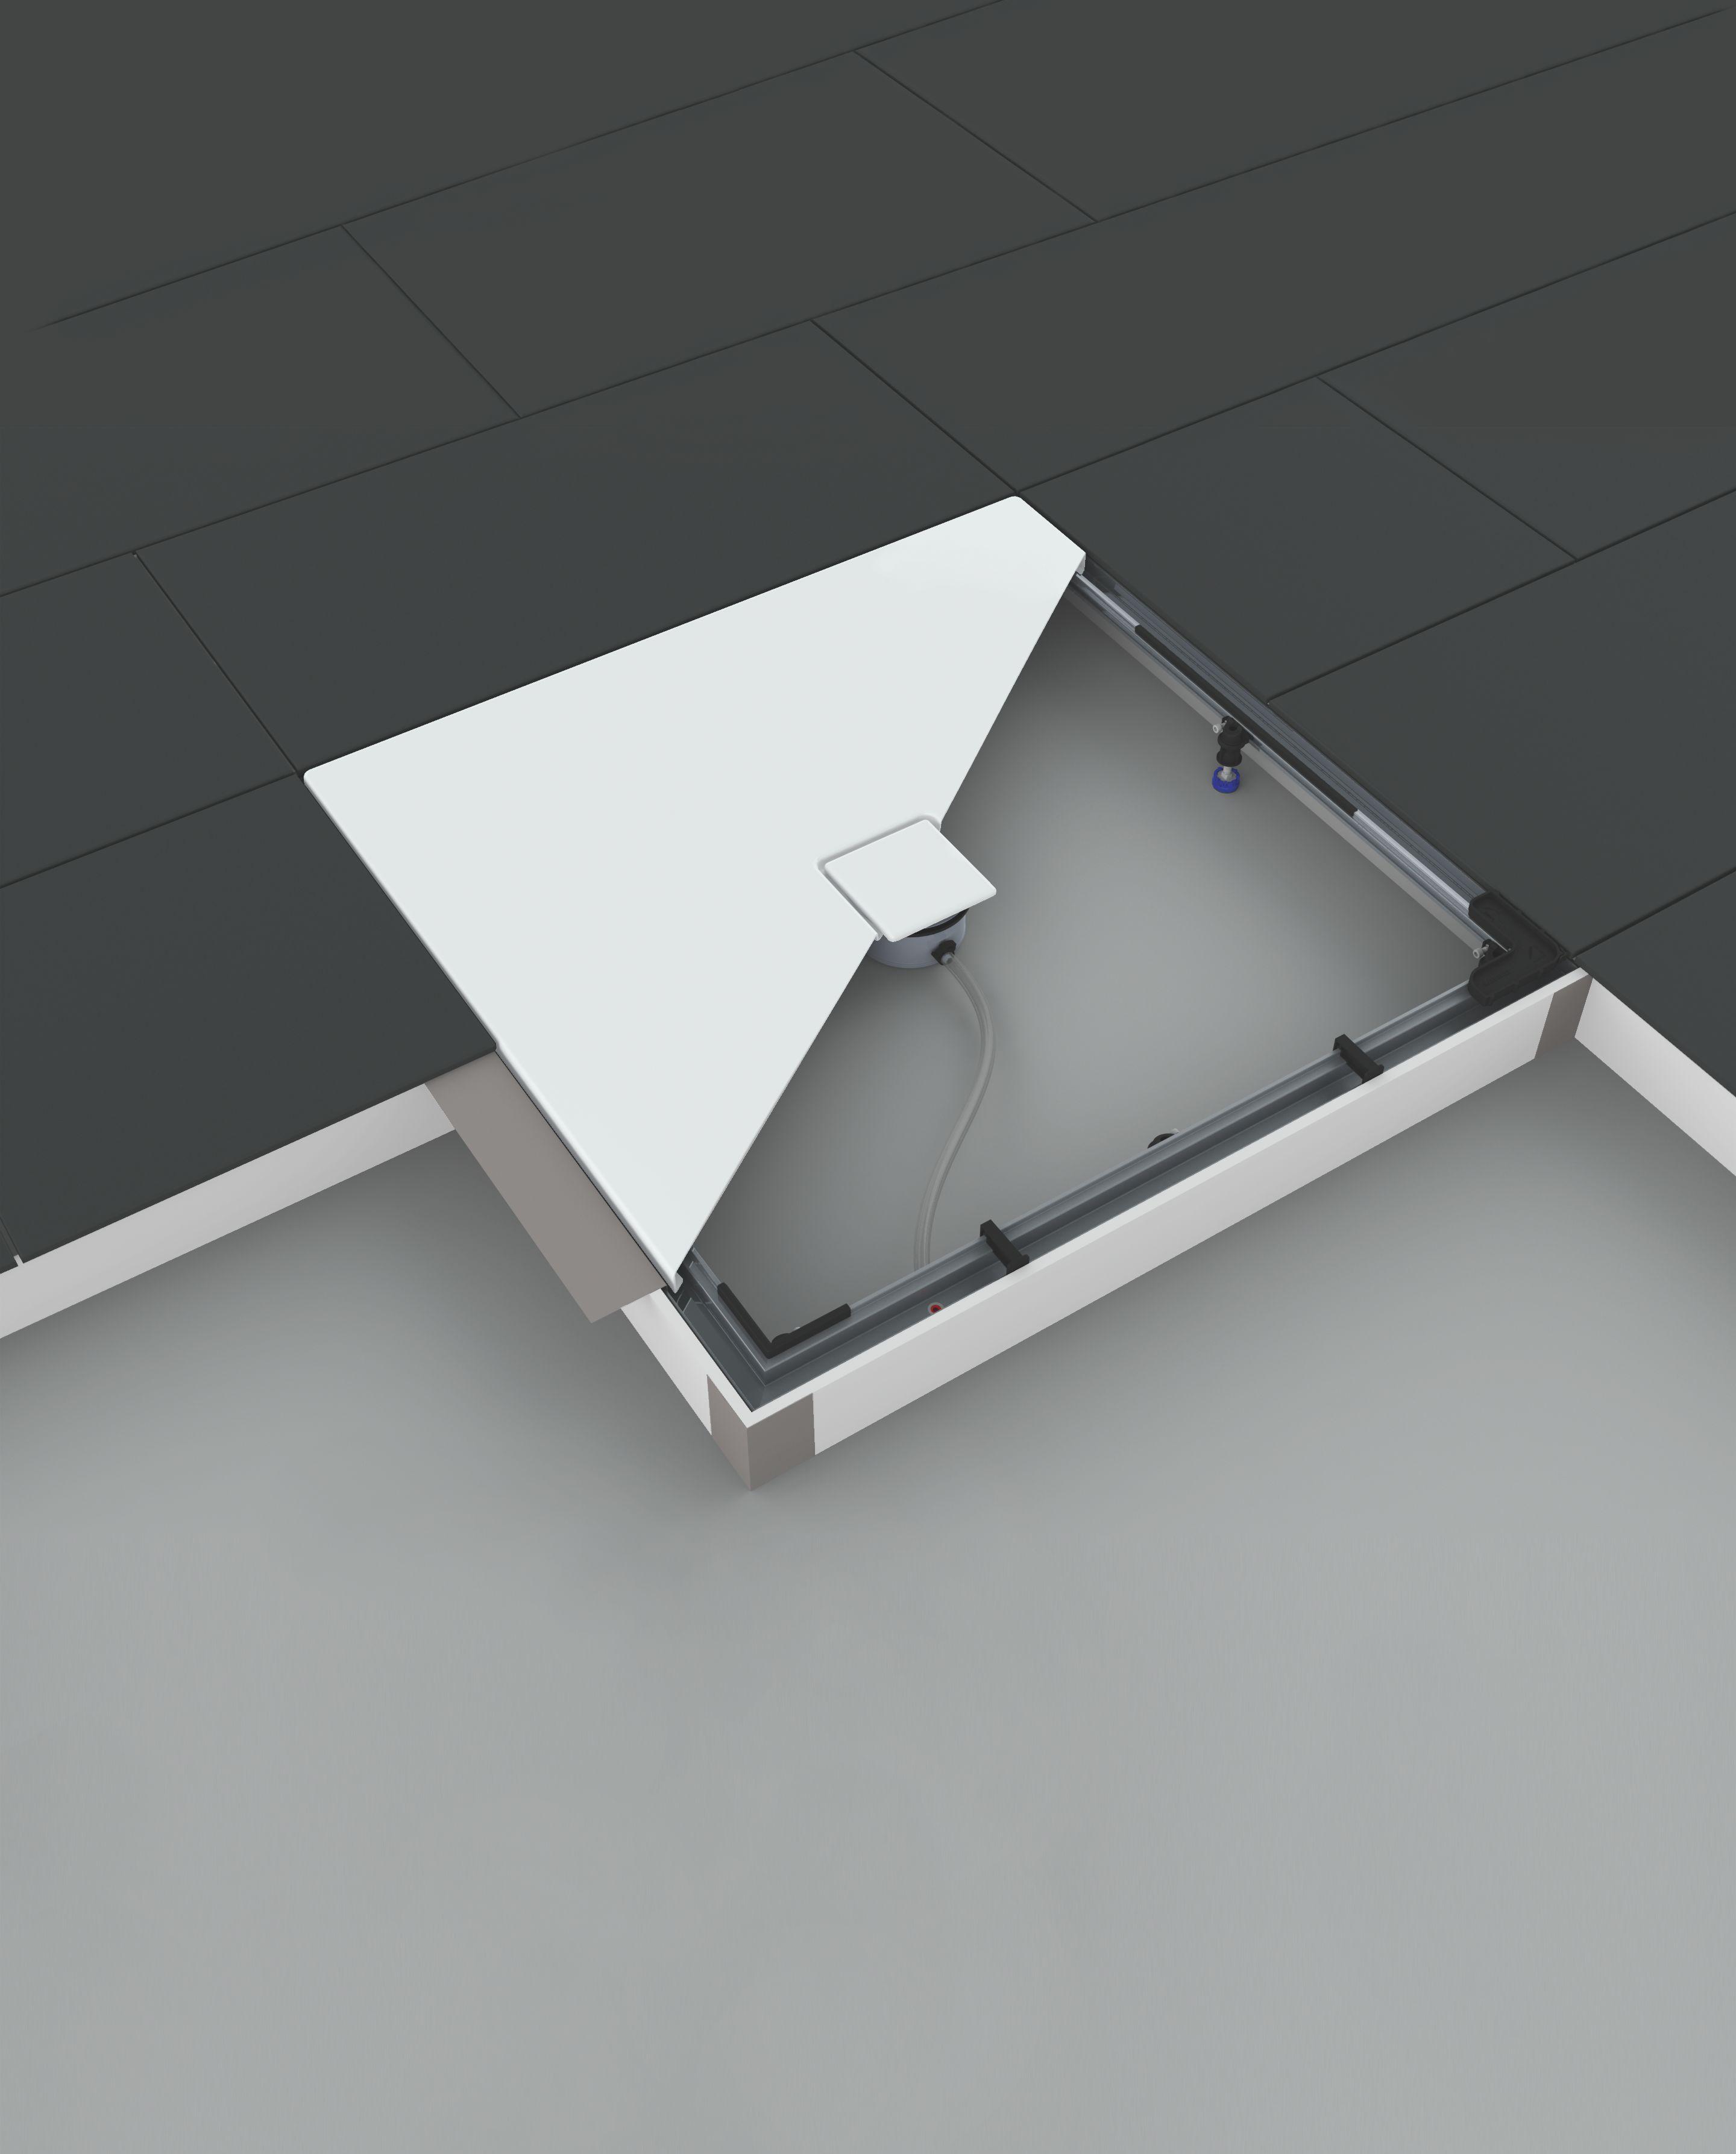 sachverst ndiger bad wanneneinbau tasseneinbau badewanne brausetasse. Black Bedroom Furniture Sets. Home Design Ideas